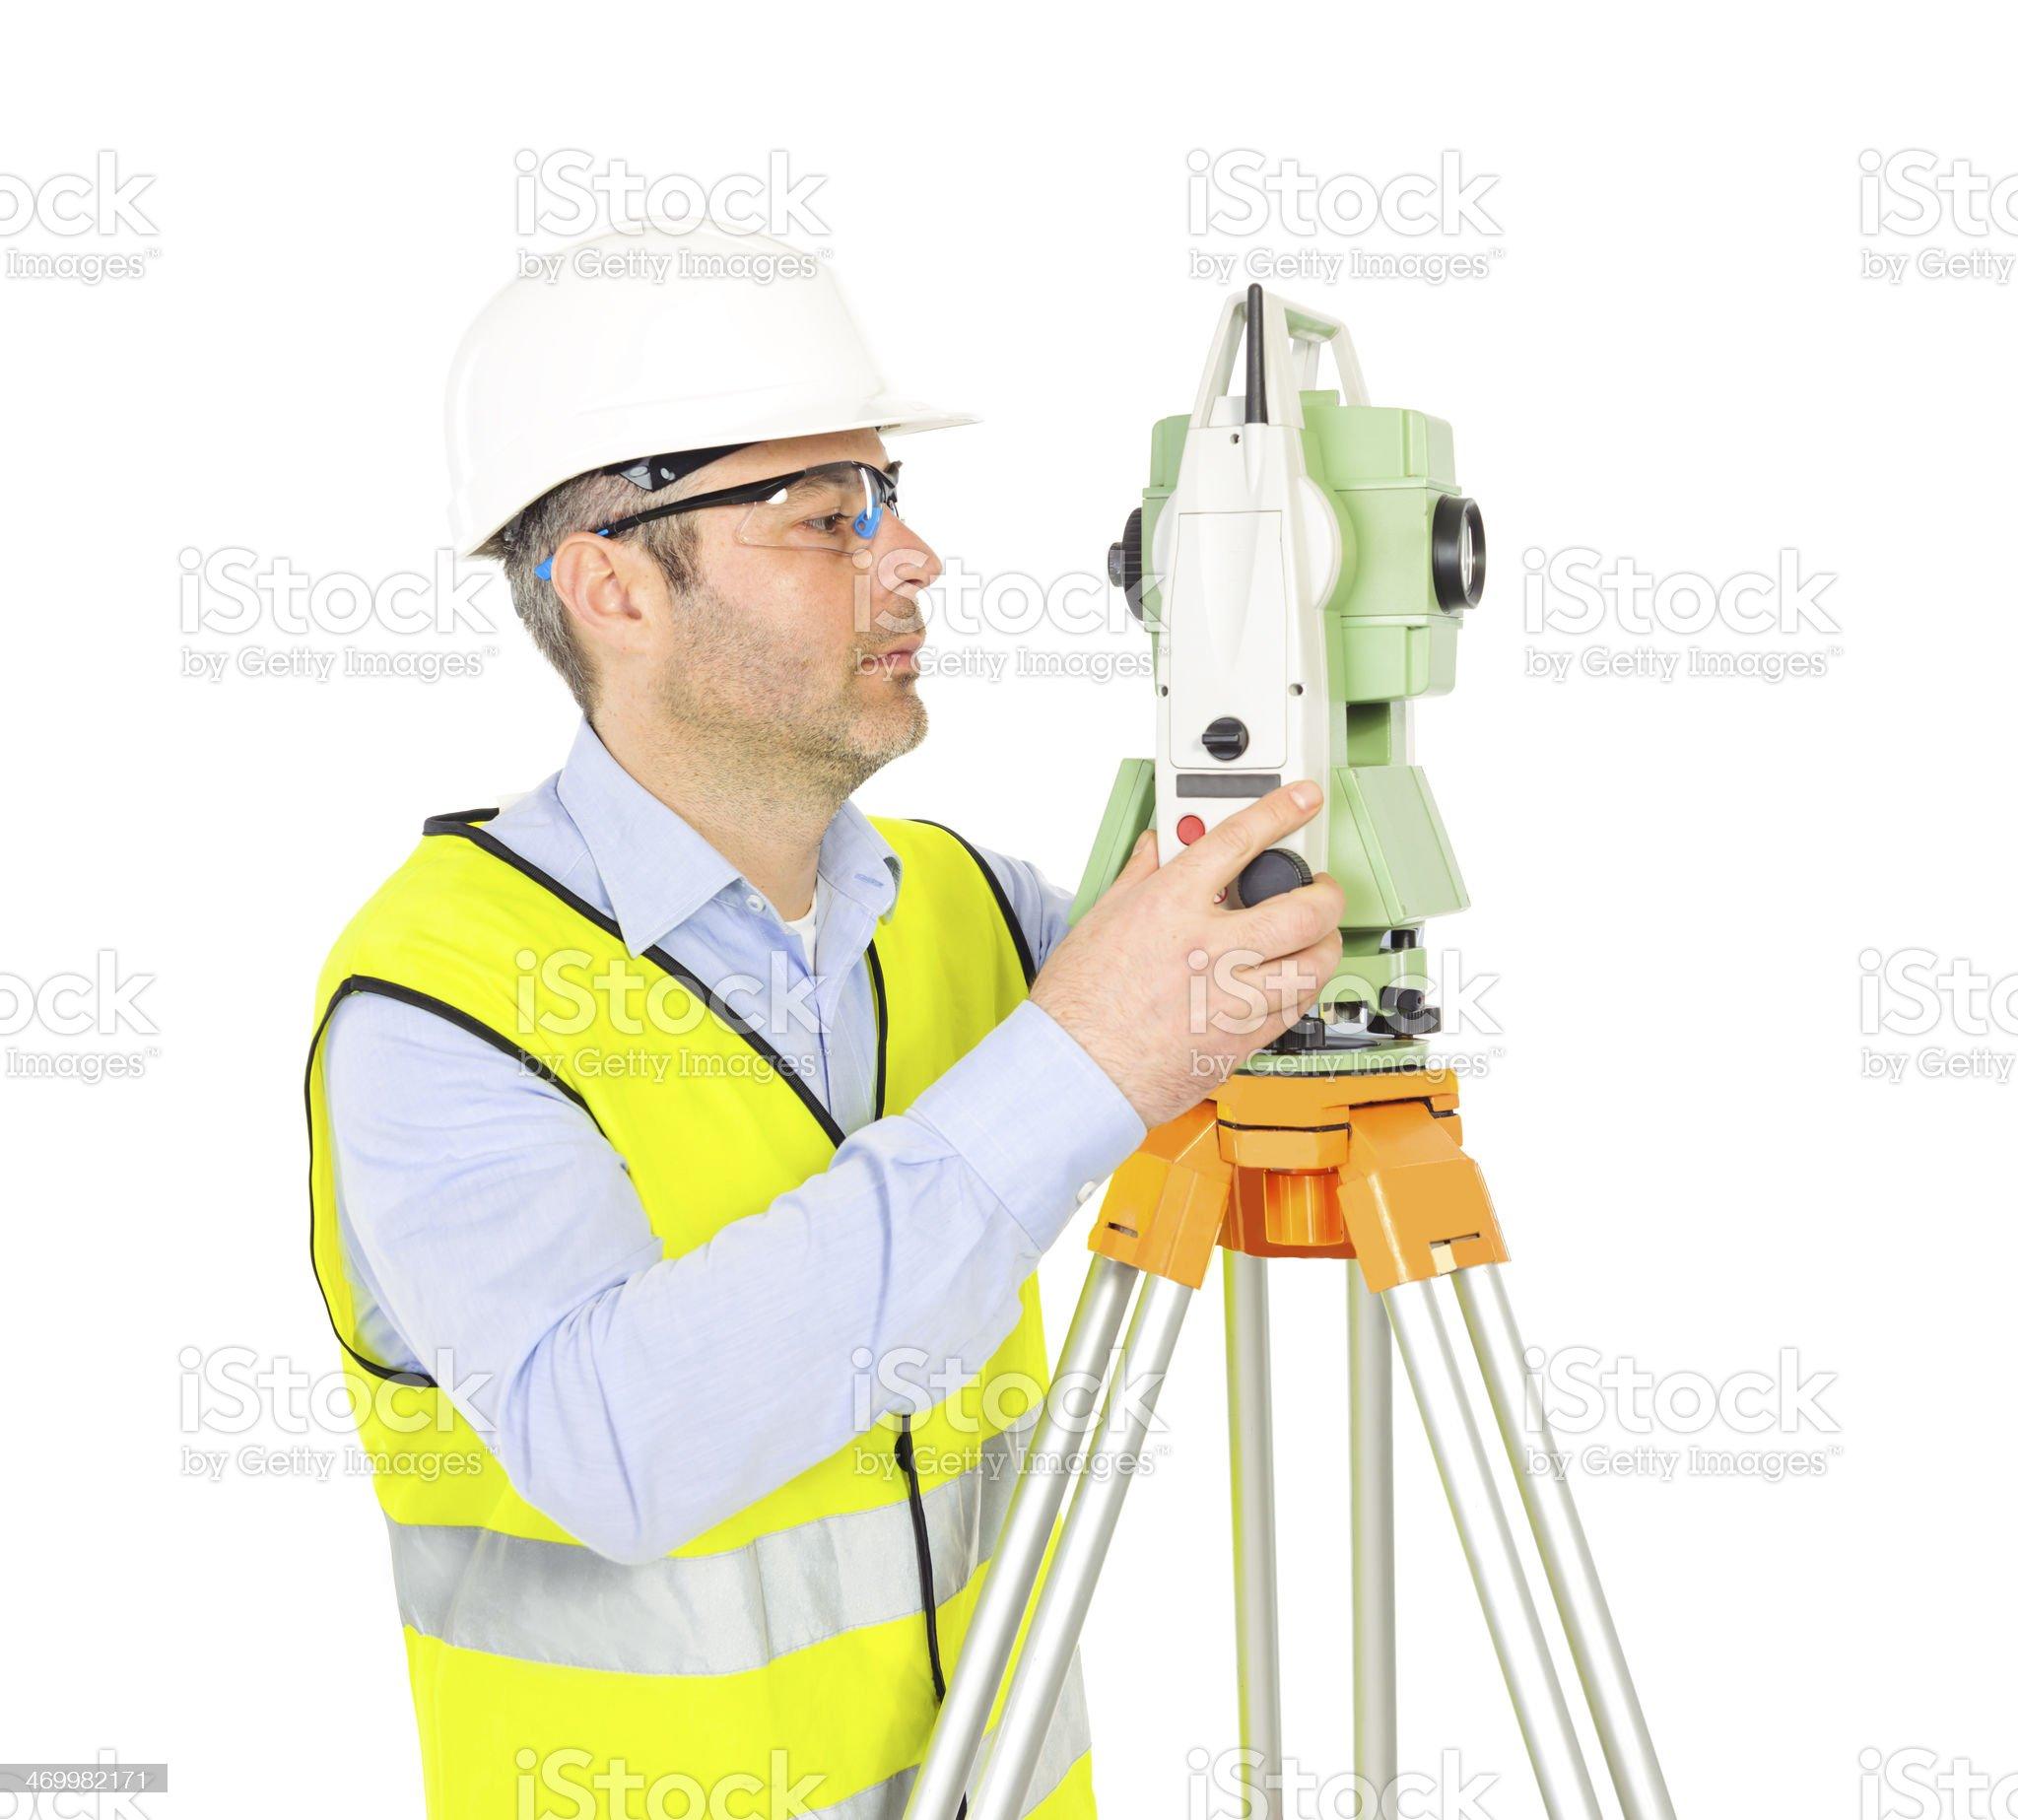 professional engineer on white background royalty-free stock photo